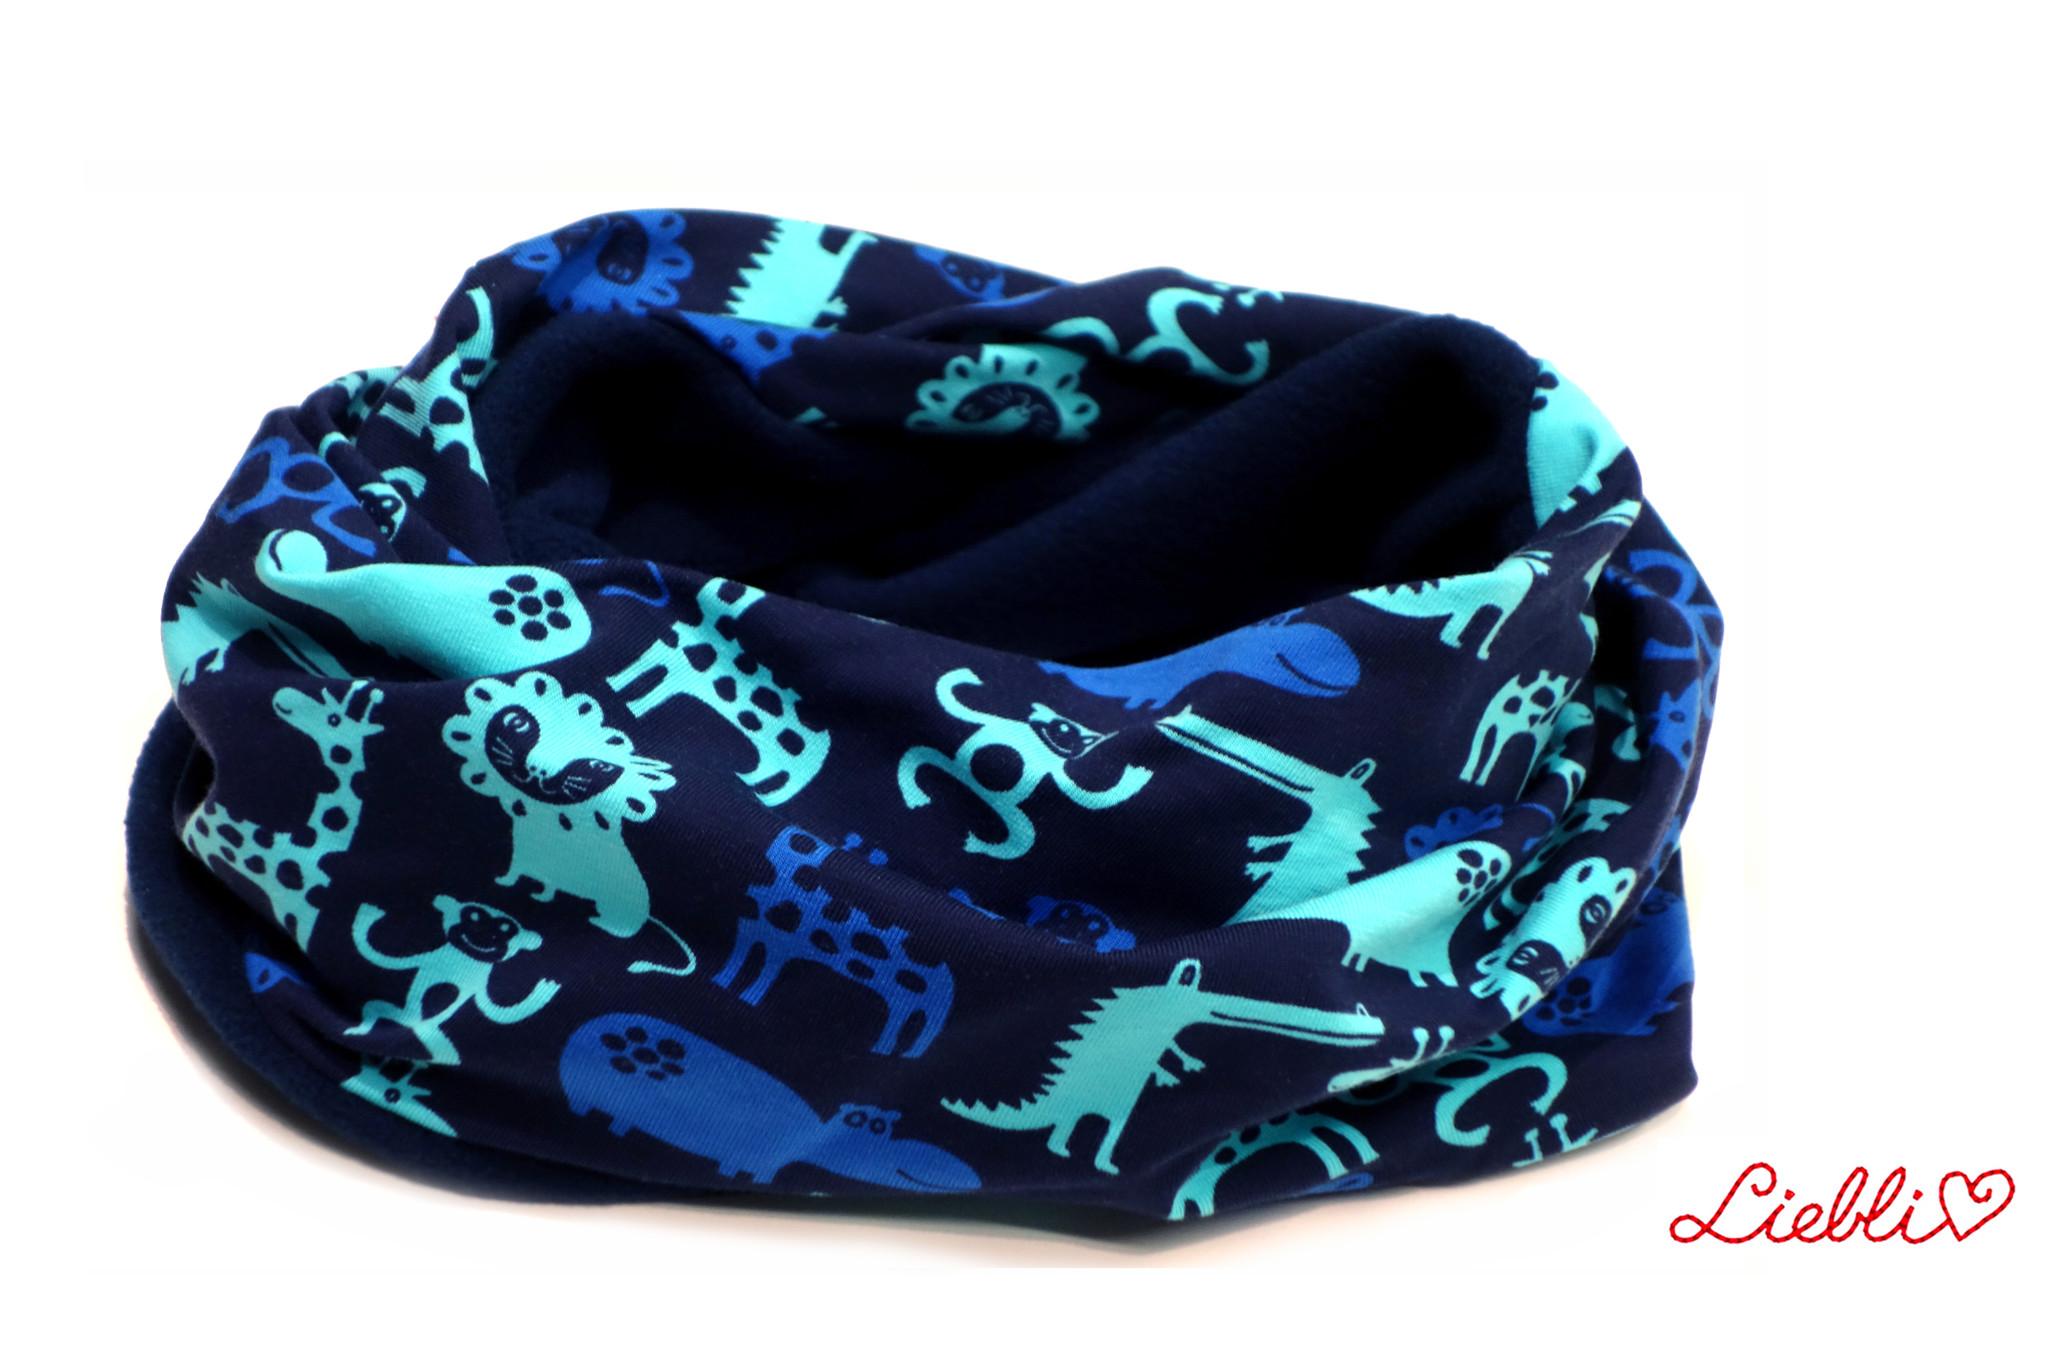 Loopschal warm, Zootiere blau-türkis